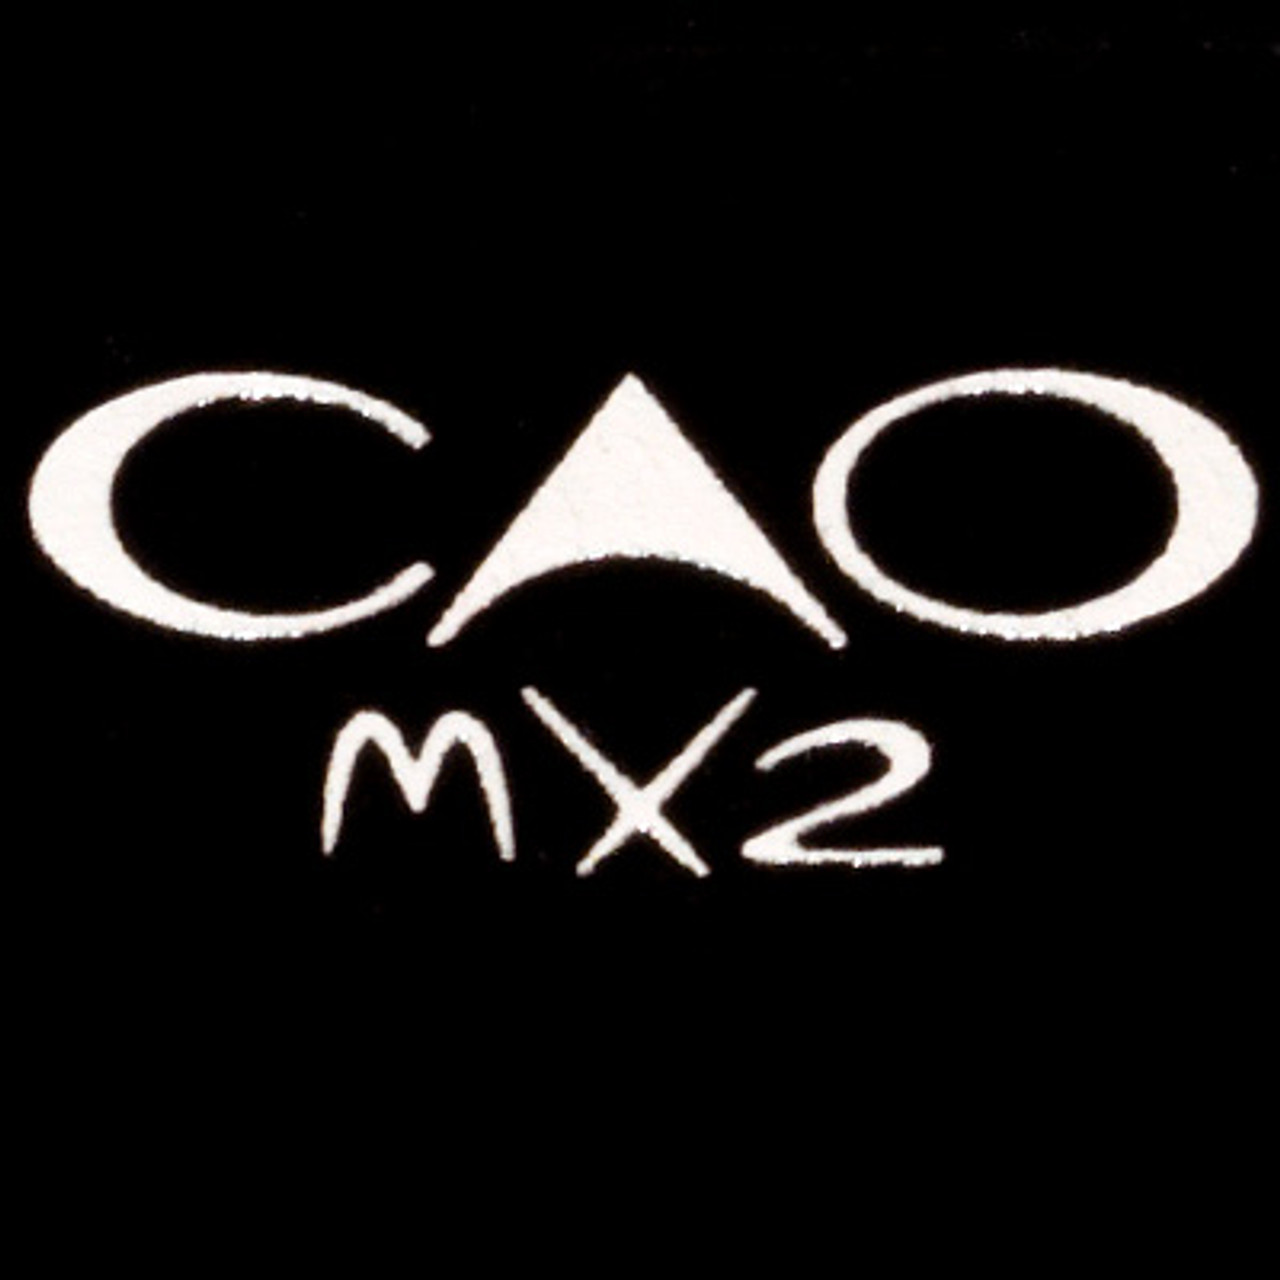 CAO MX2 Belicoso Cigars - 7 x 56 (Box of 20)